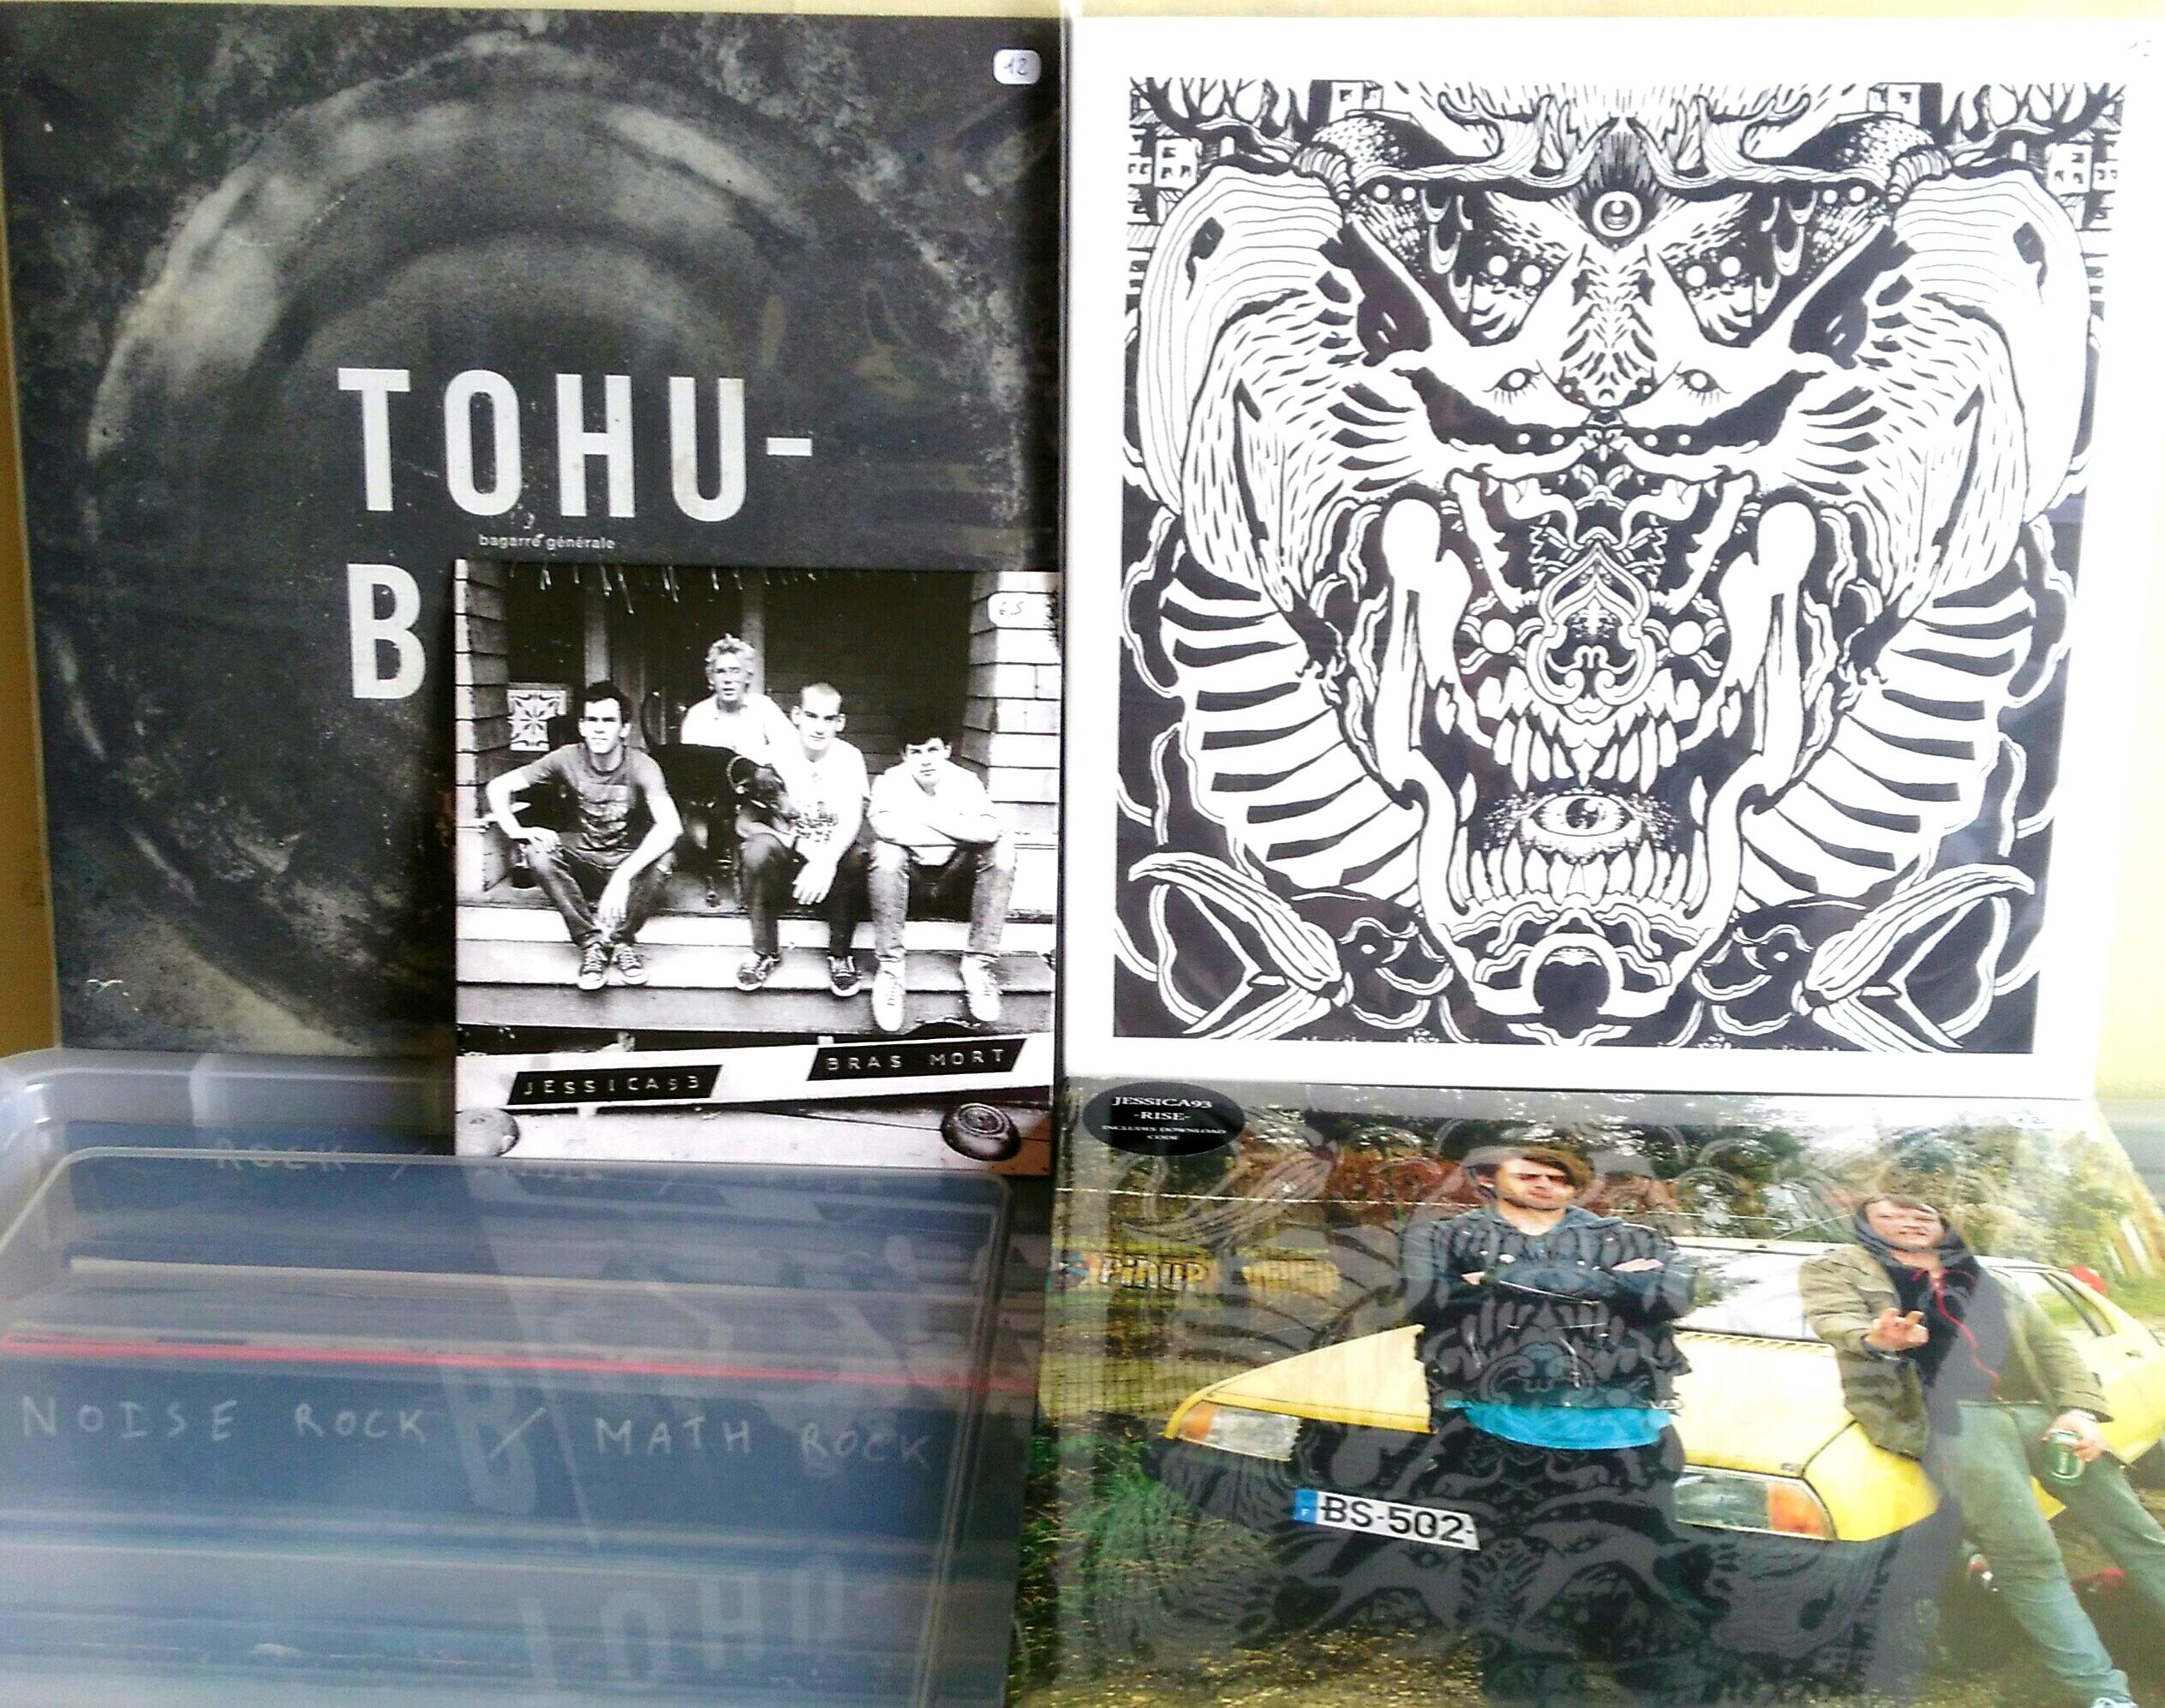 Shop | Music Fear Satan : BAGARRE GENERALE, JESSICA93, BRAS MORT, MONARCH, BIRUSHANAH